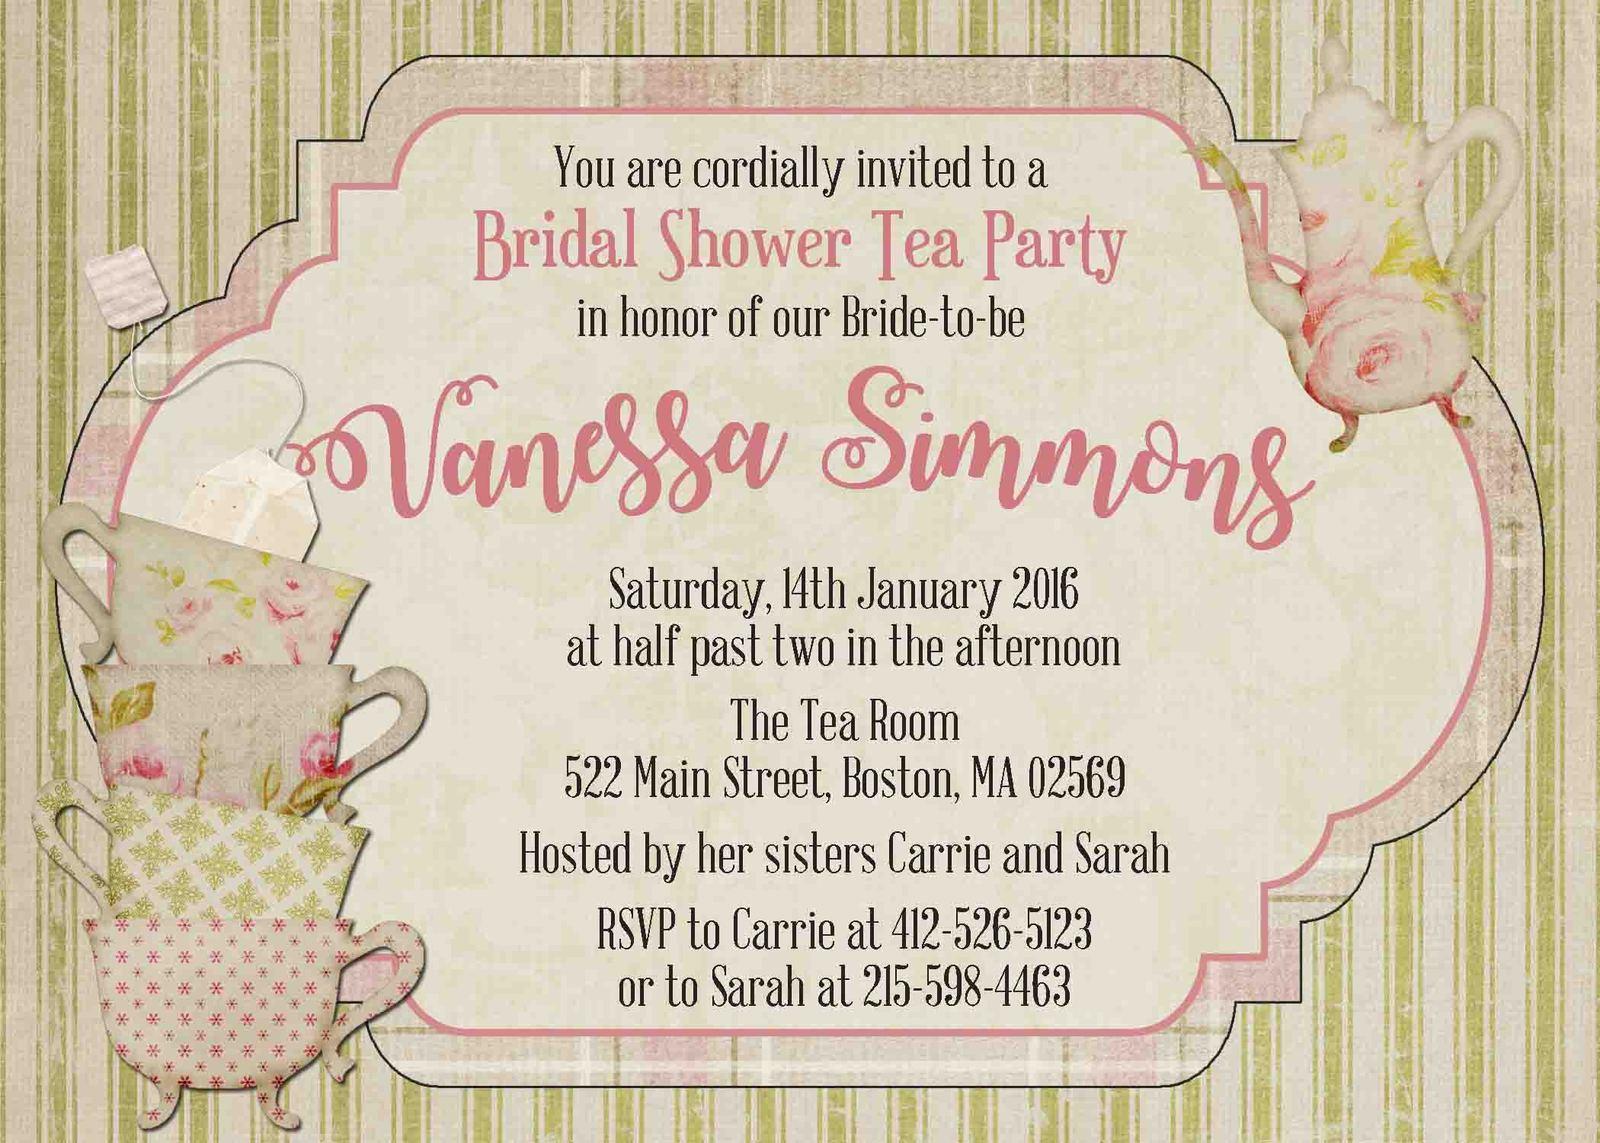 Vintage bridal shower tea party invitation personalized for Classic bridal shower invitations